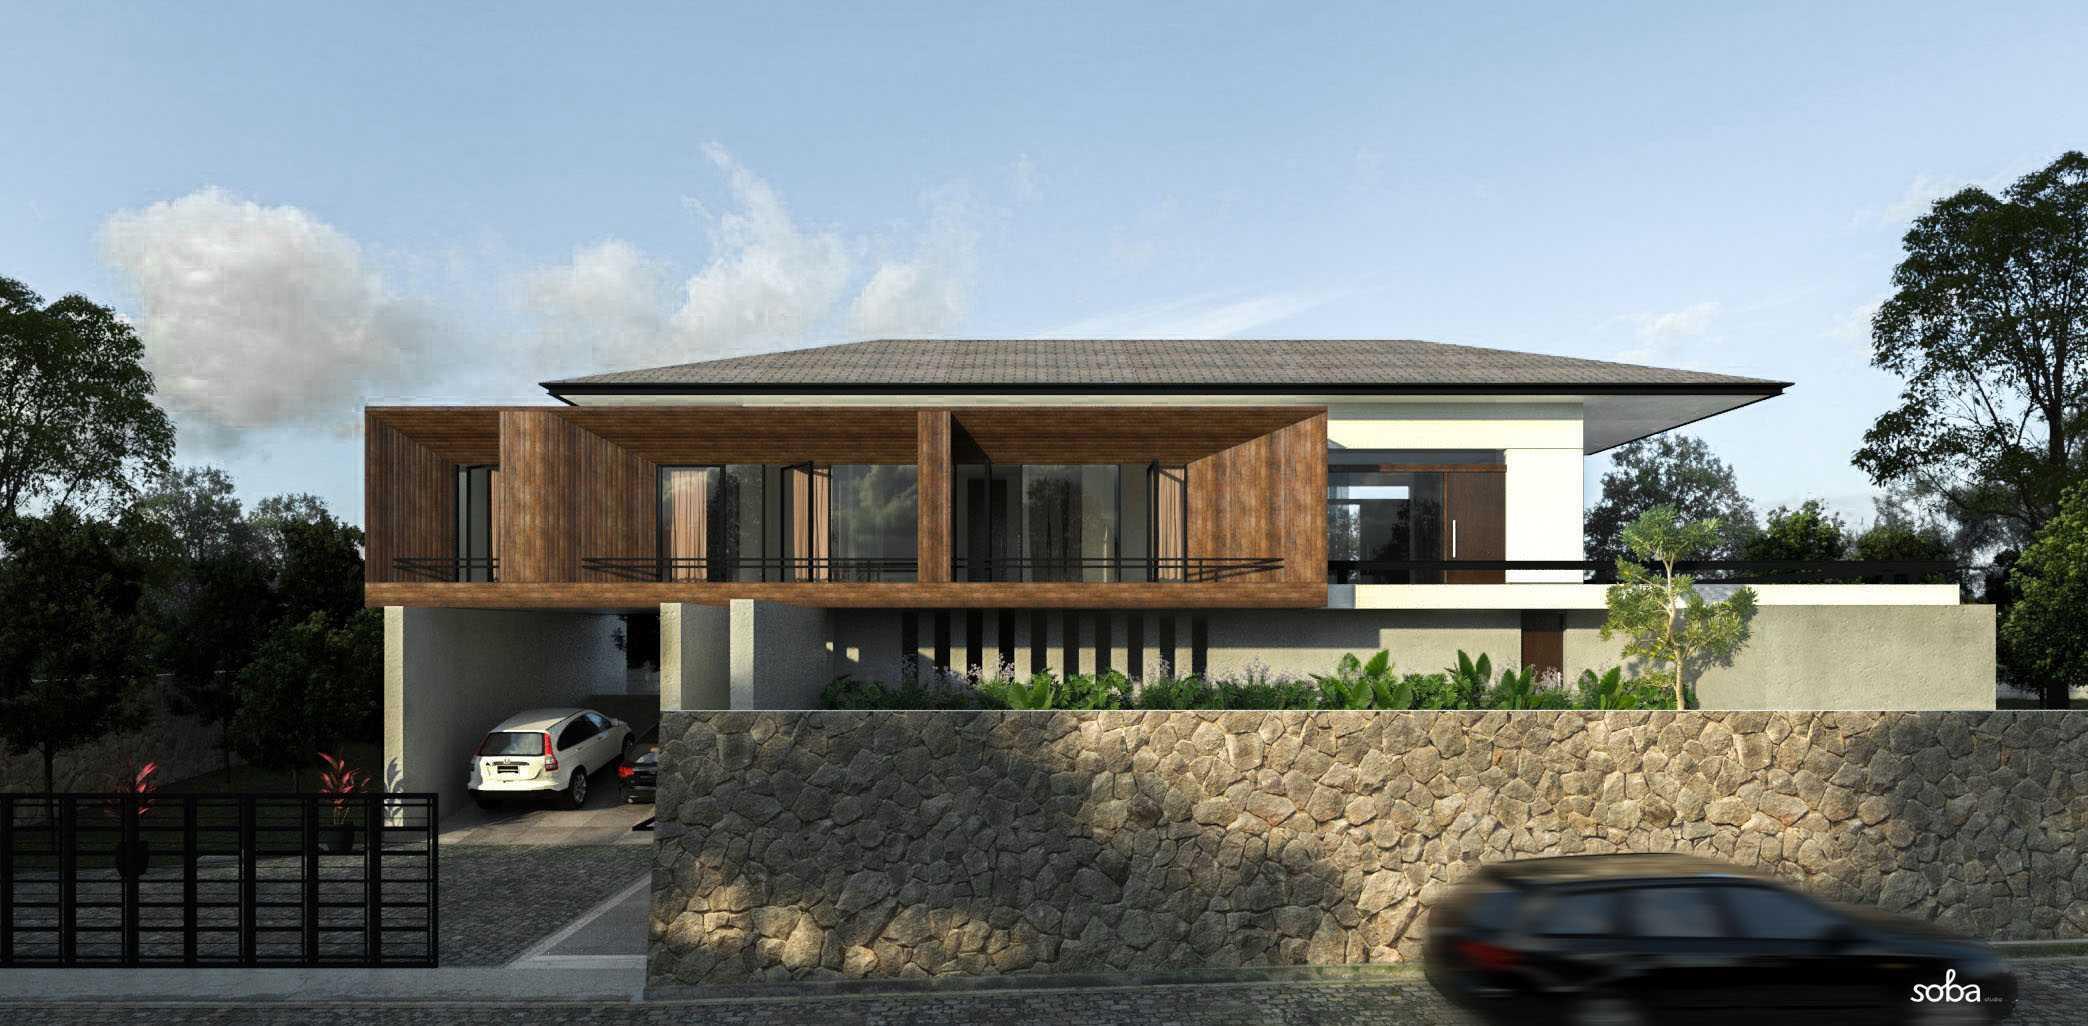 Endarasman Villa Trikora Banjarbaru, Banjarbaru City, South Kalimantan, Indonesia Banjarbaru Front View   16004